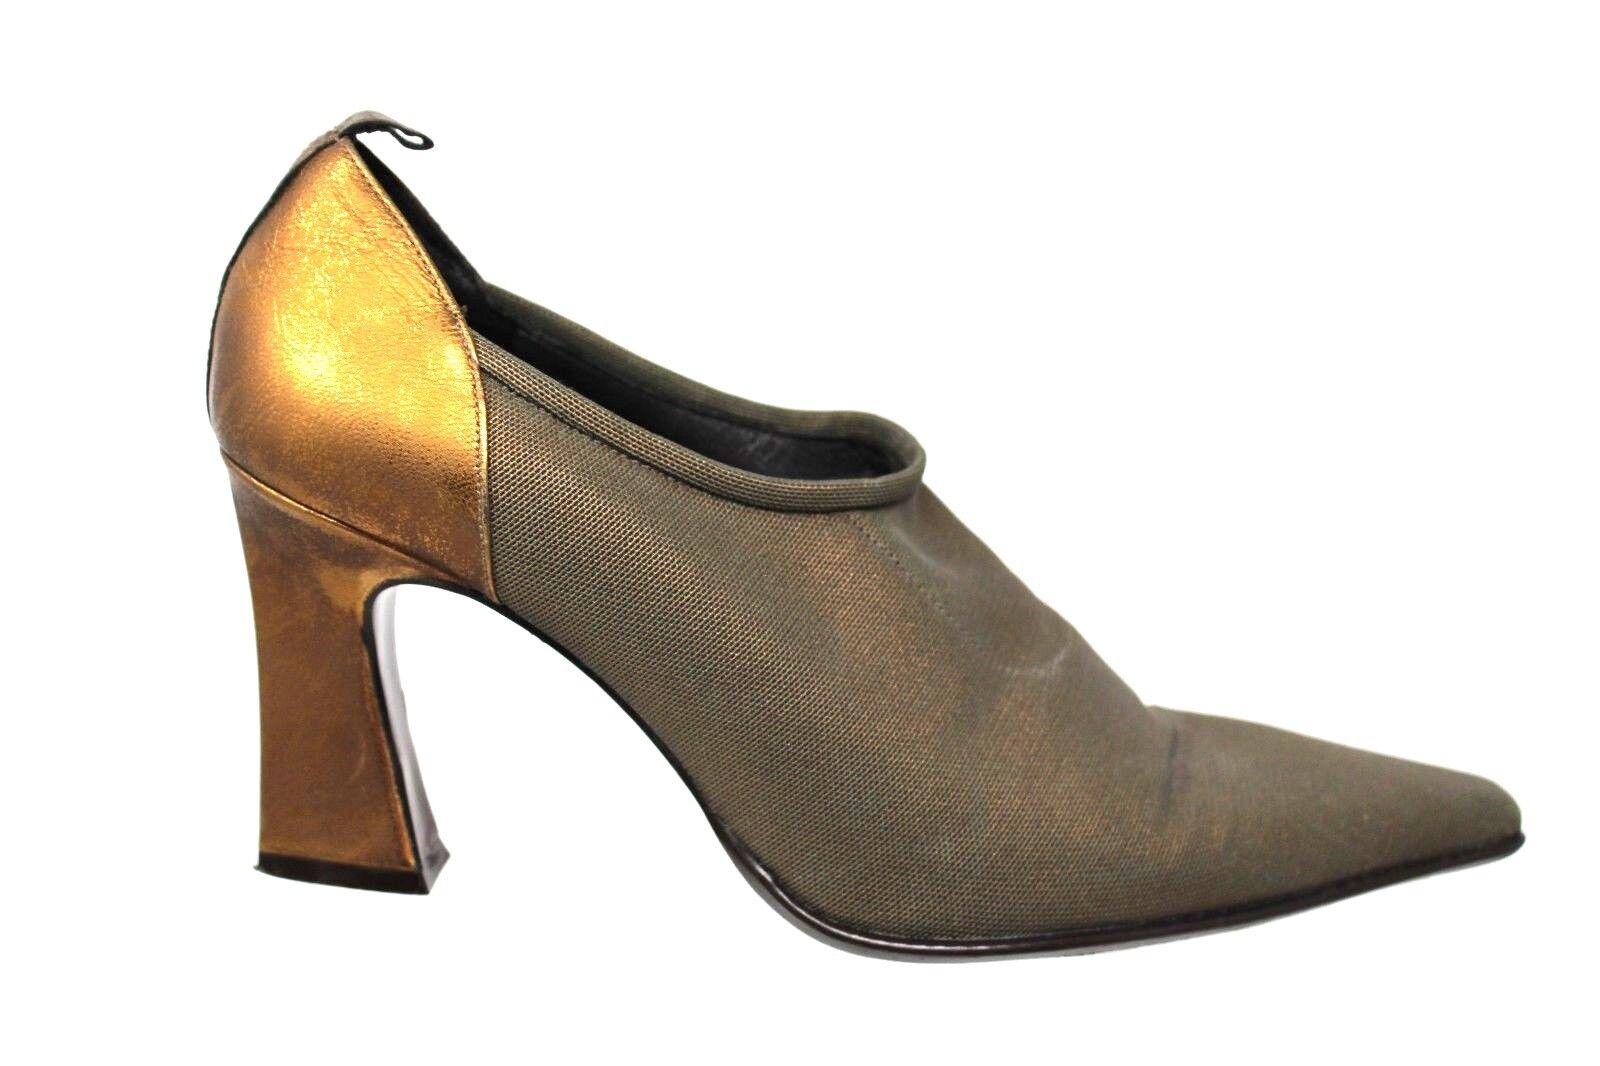 Donald J Pliner MENIA Bronze Stretch Fabric Leather Pumps Heels Size 8.5